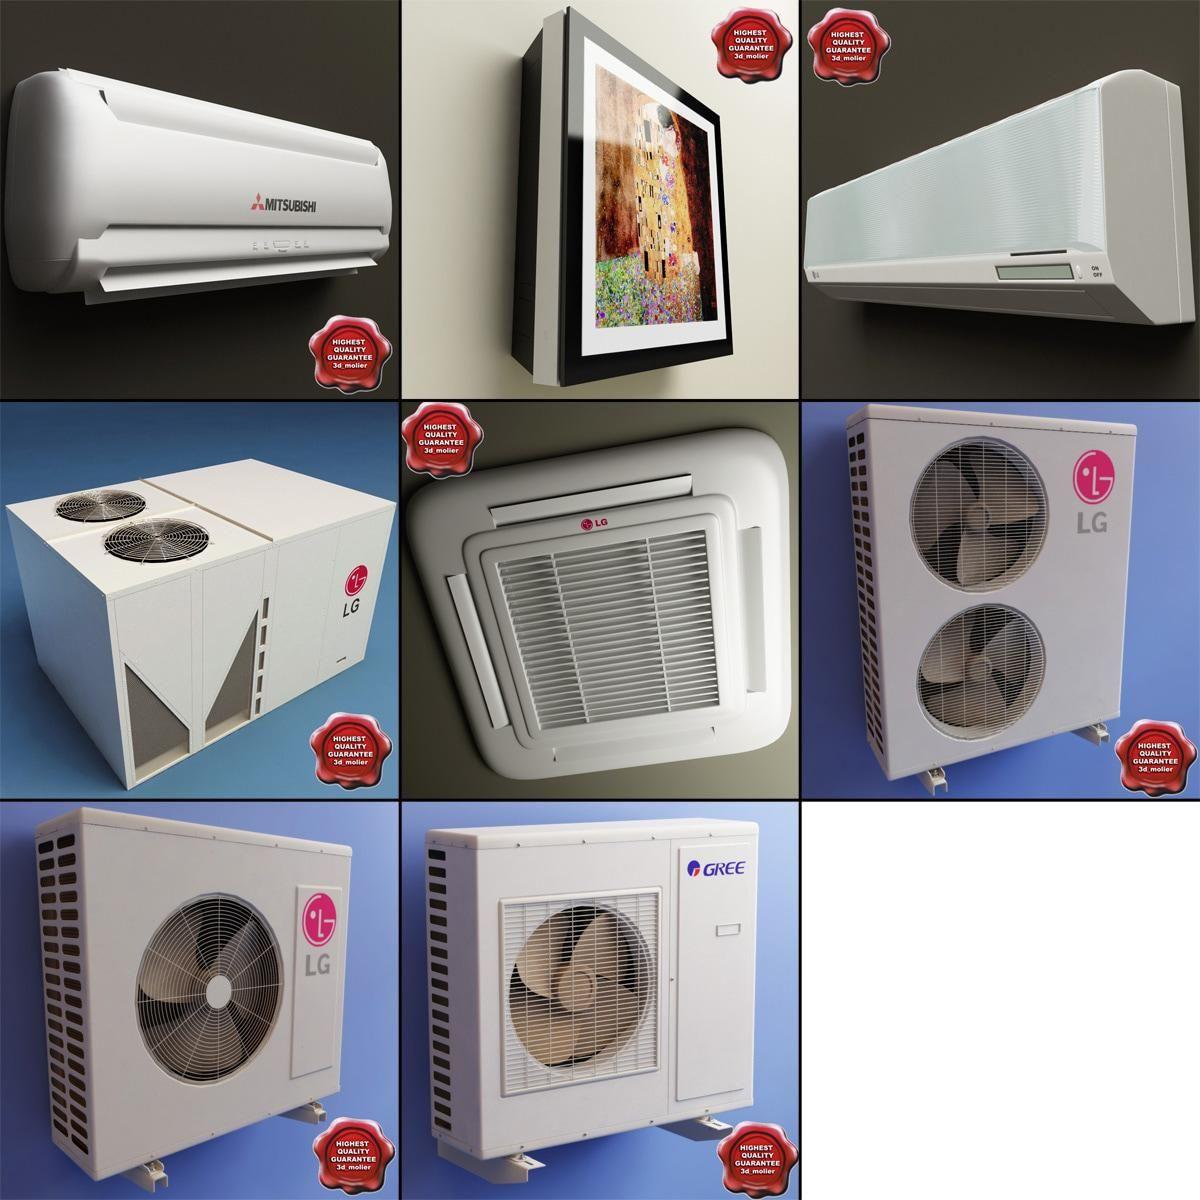 lg art cool air conditioner